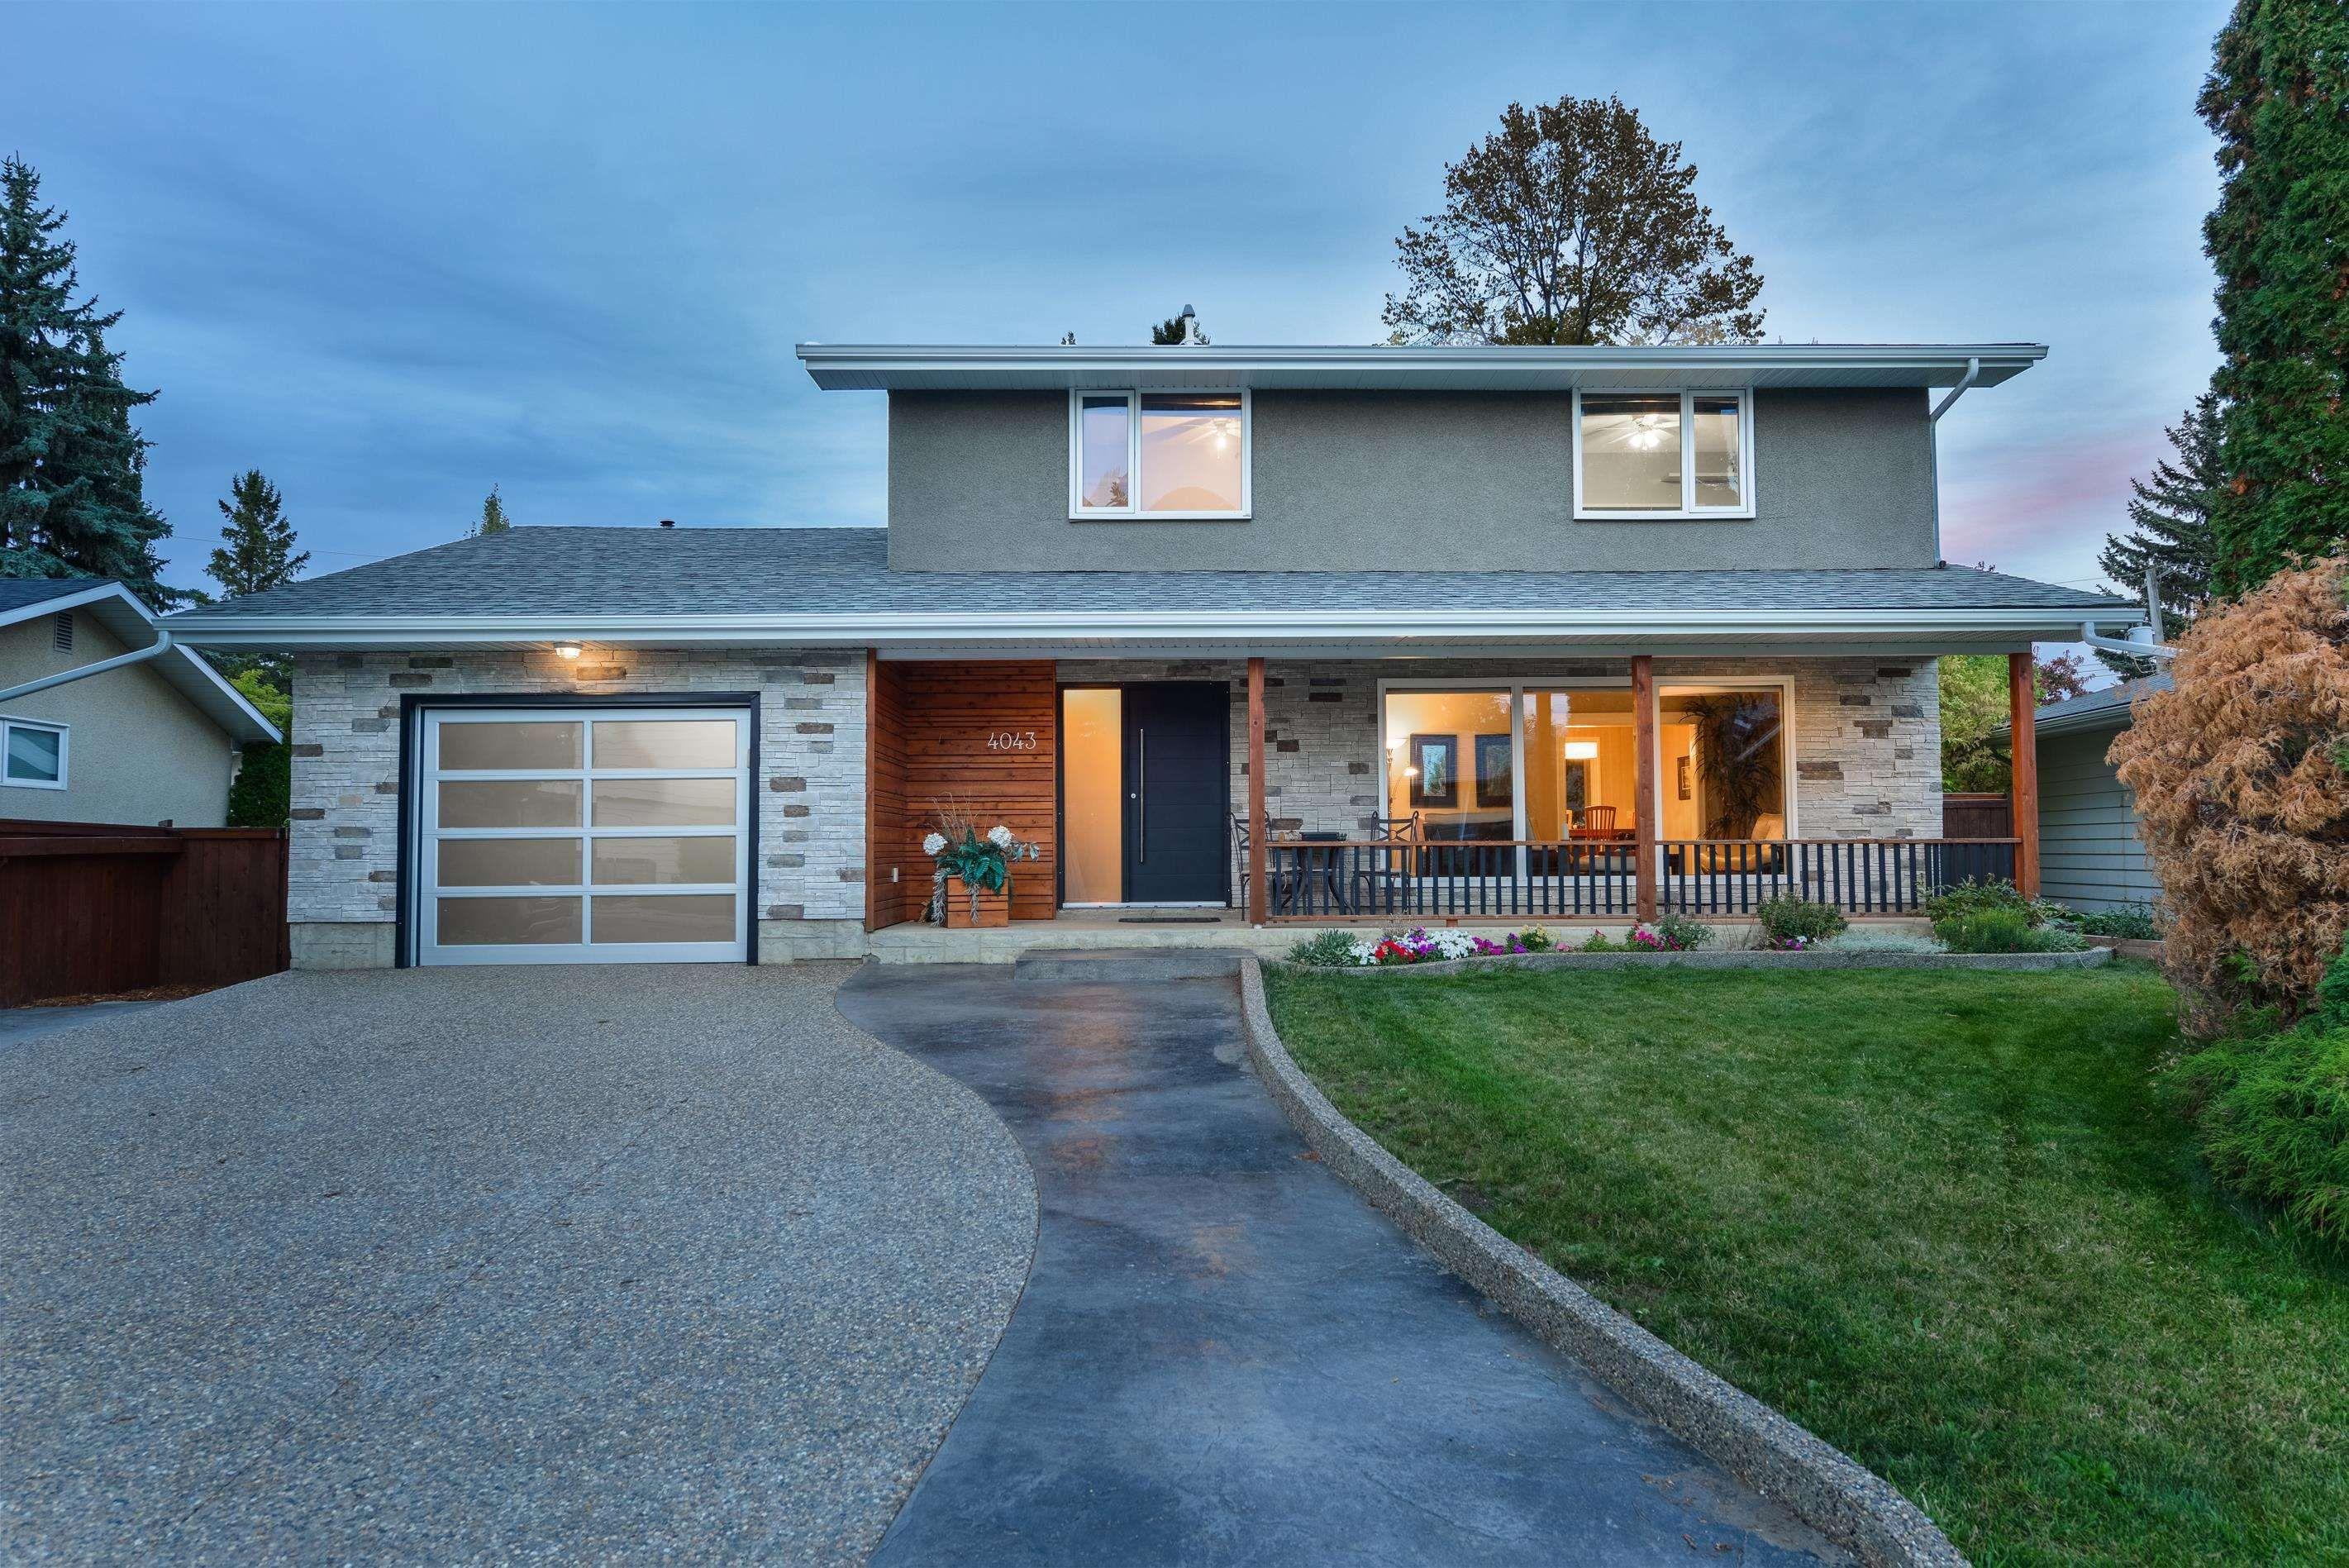 Main Photo: 4043 120 Street in Edmonton: Zone 16 House for sale : MLS®# E4264309